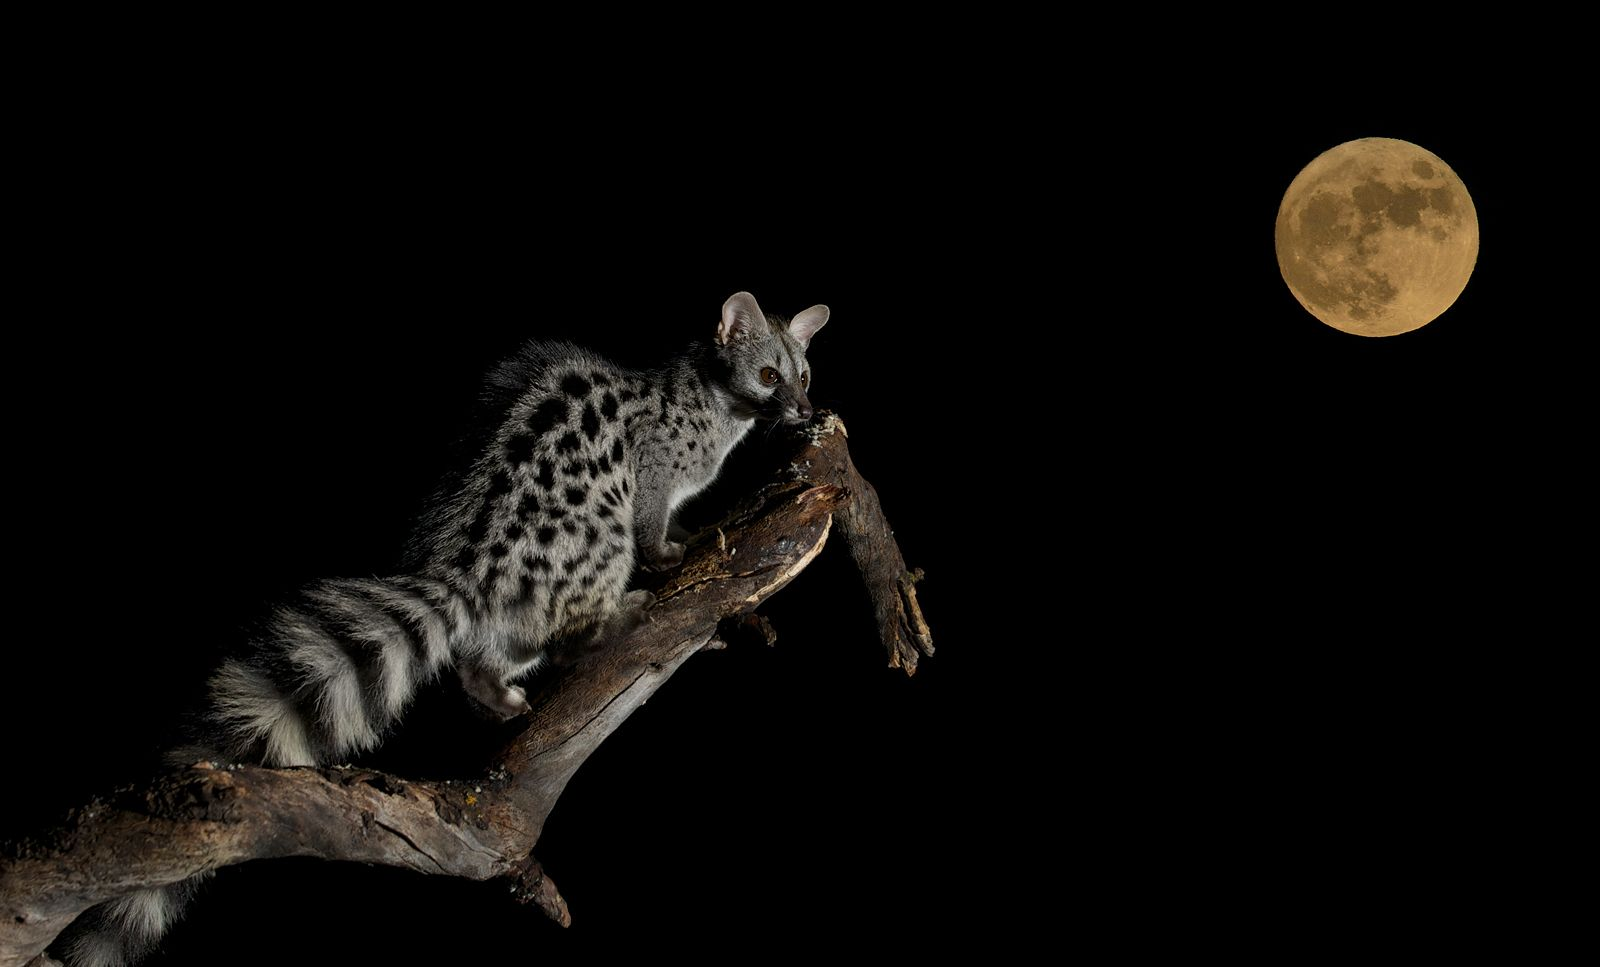 [Genetta genetta] Whispering at the moon ©Javier Villegas